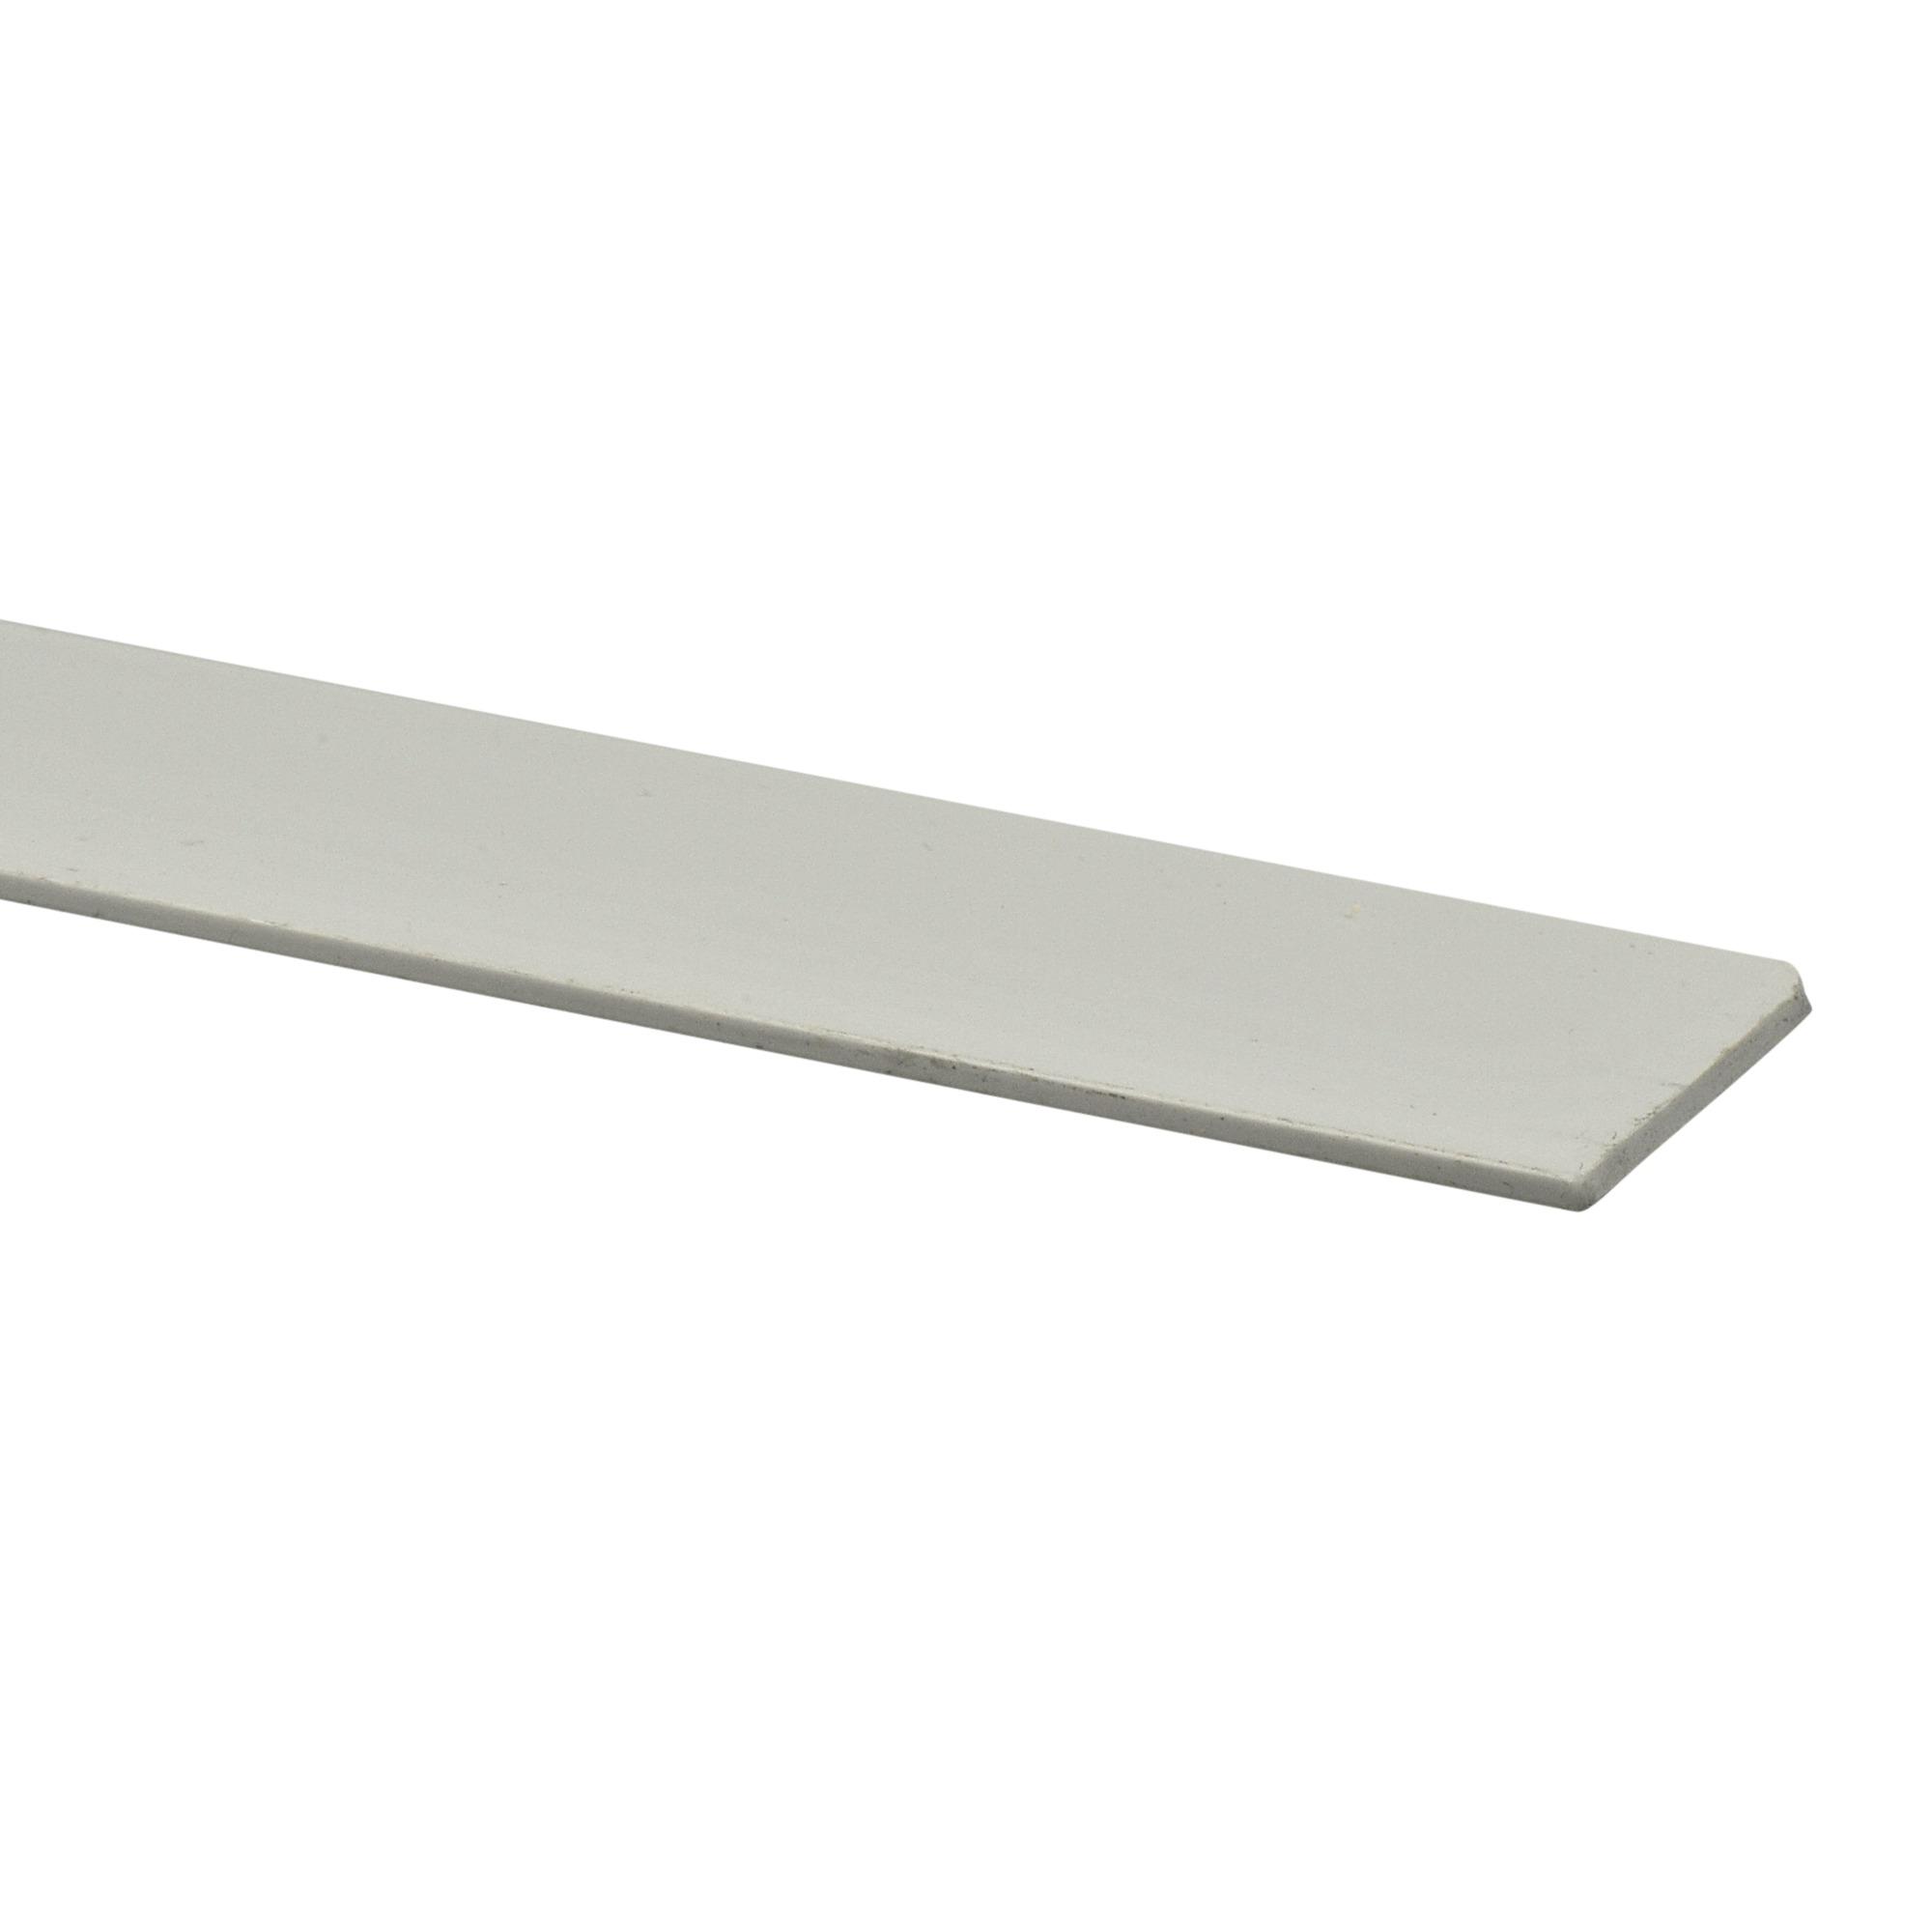 Afdekprofiel kunststof wit 2x30 mm 260 cm kunststof for Aanrechtblad karwei